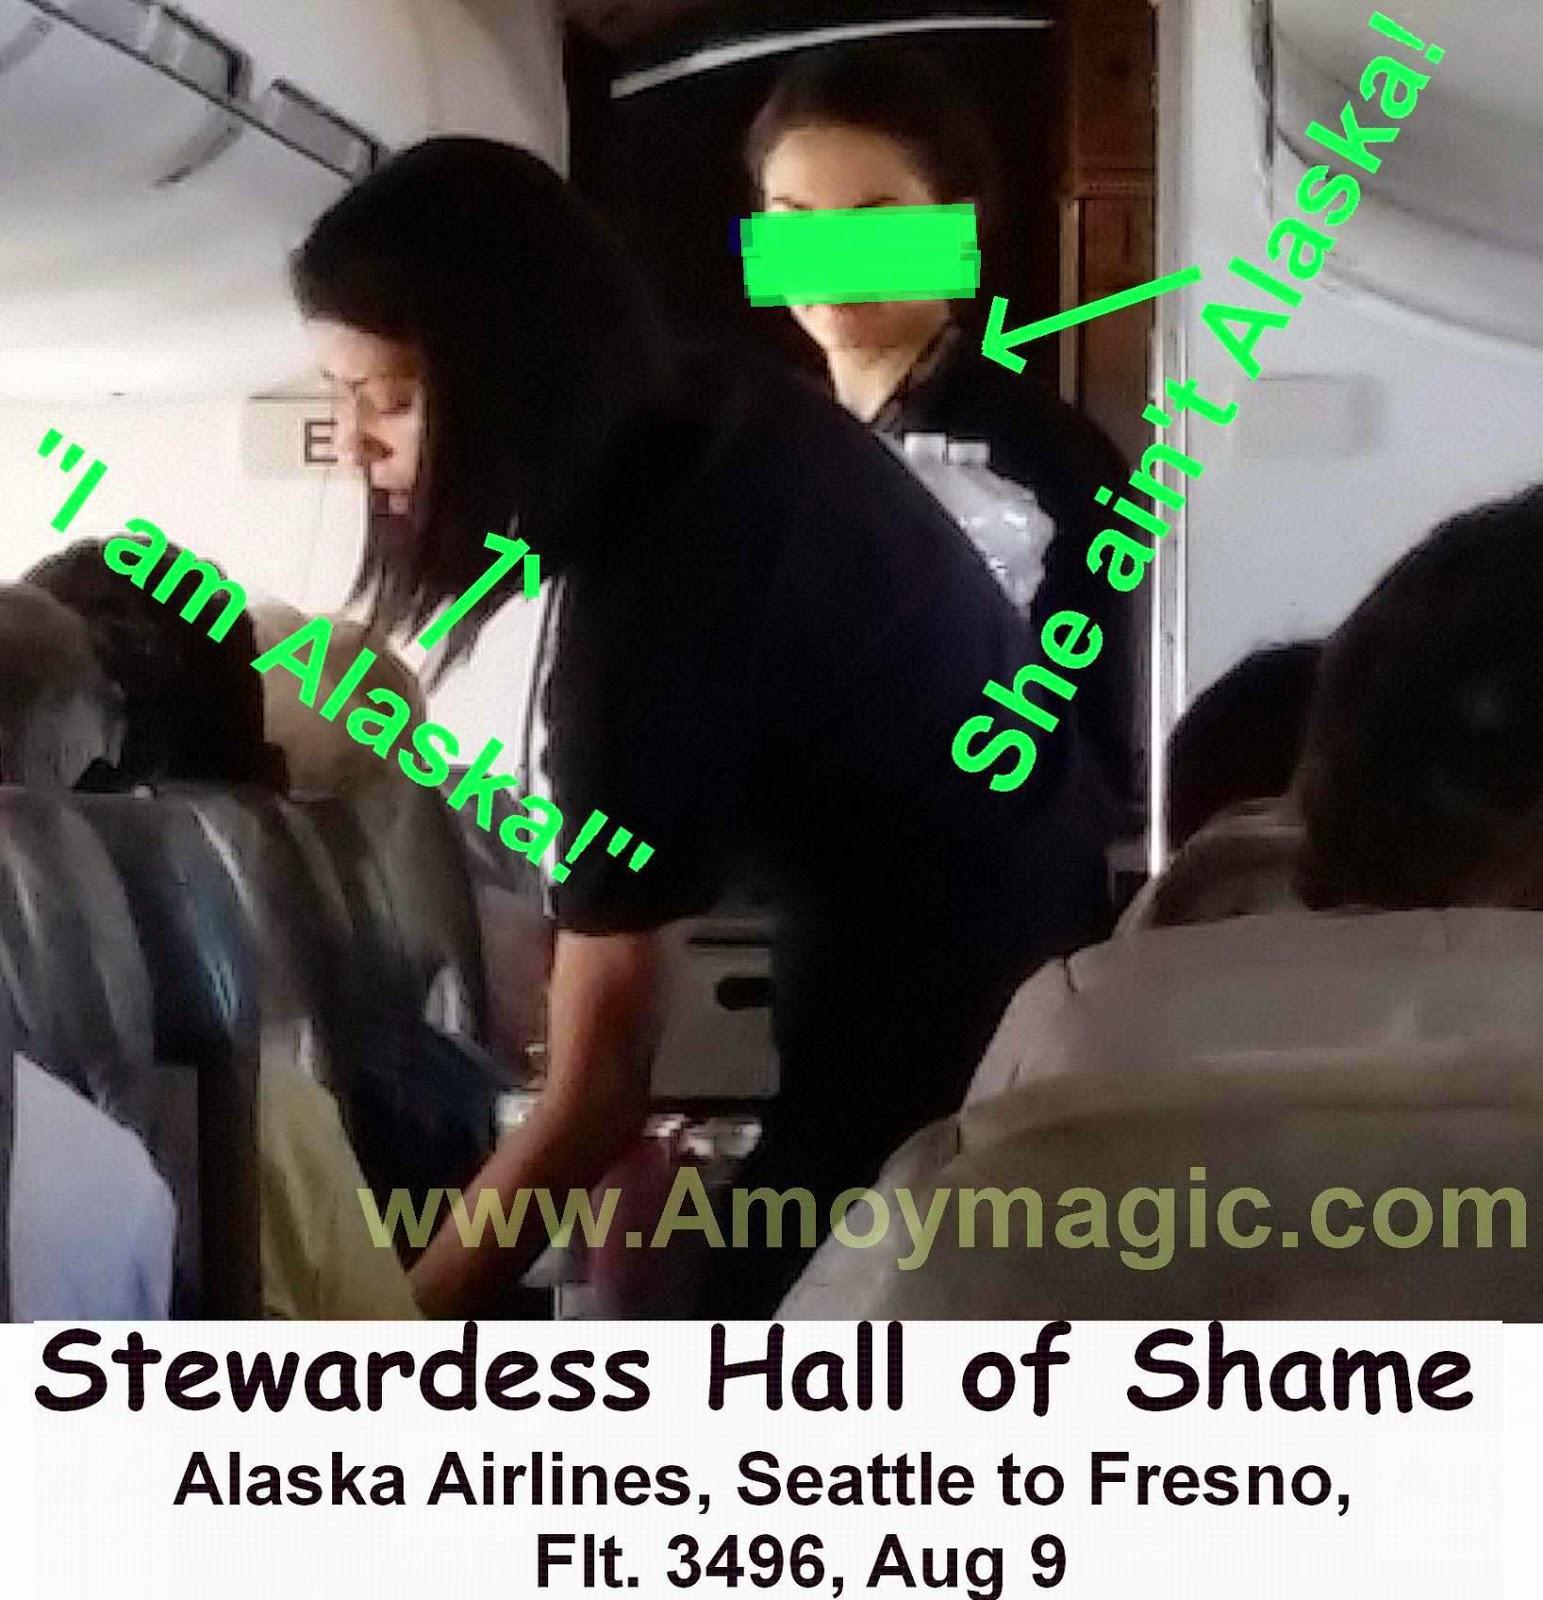 Flight Attendant Stewardess Hall of Shame Alaska Airlines Flight 3496 August 9 Seattle Fresno